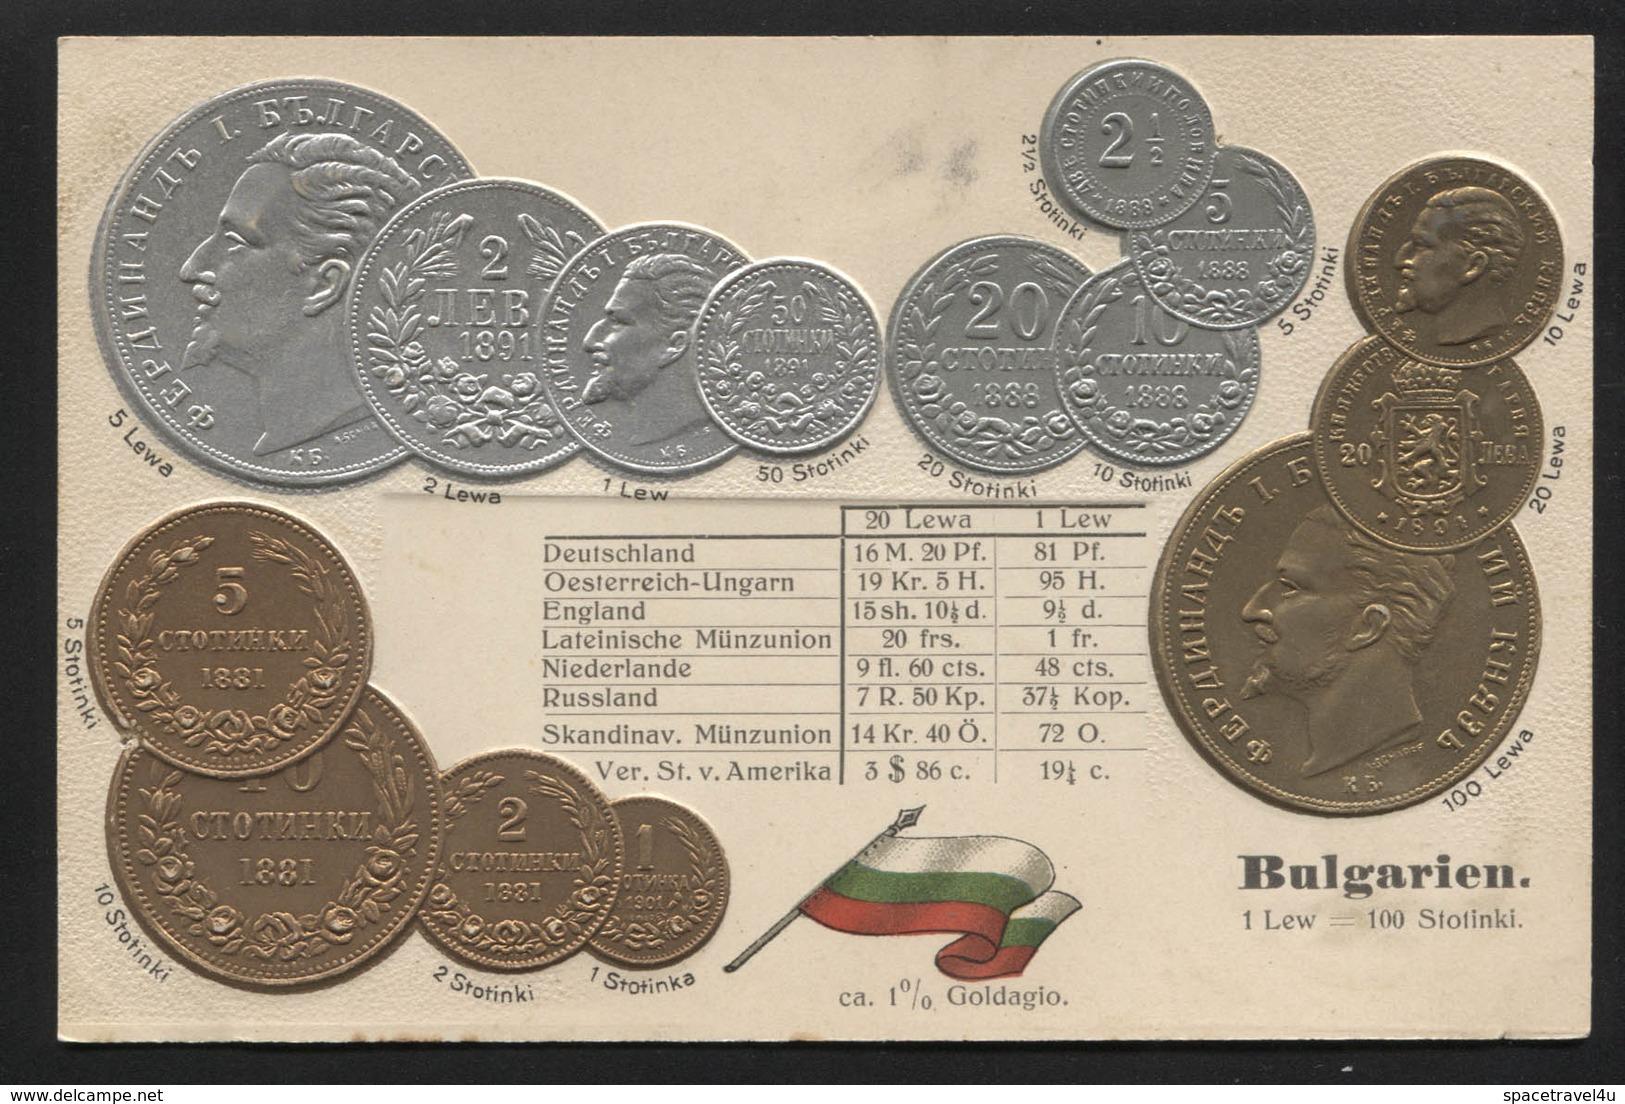 BULGARIA - Numismatic Postcard - Set Of Coins - Embossed (APAT#113) - Bulgaria